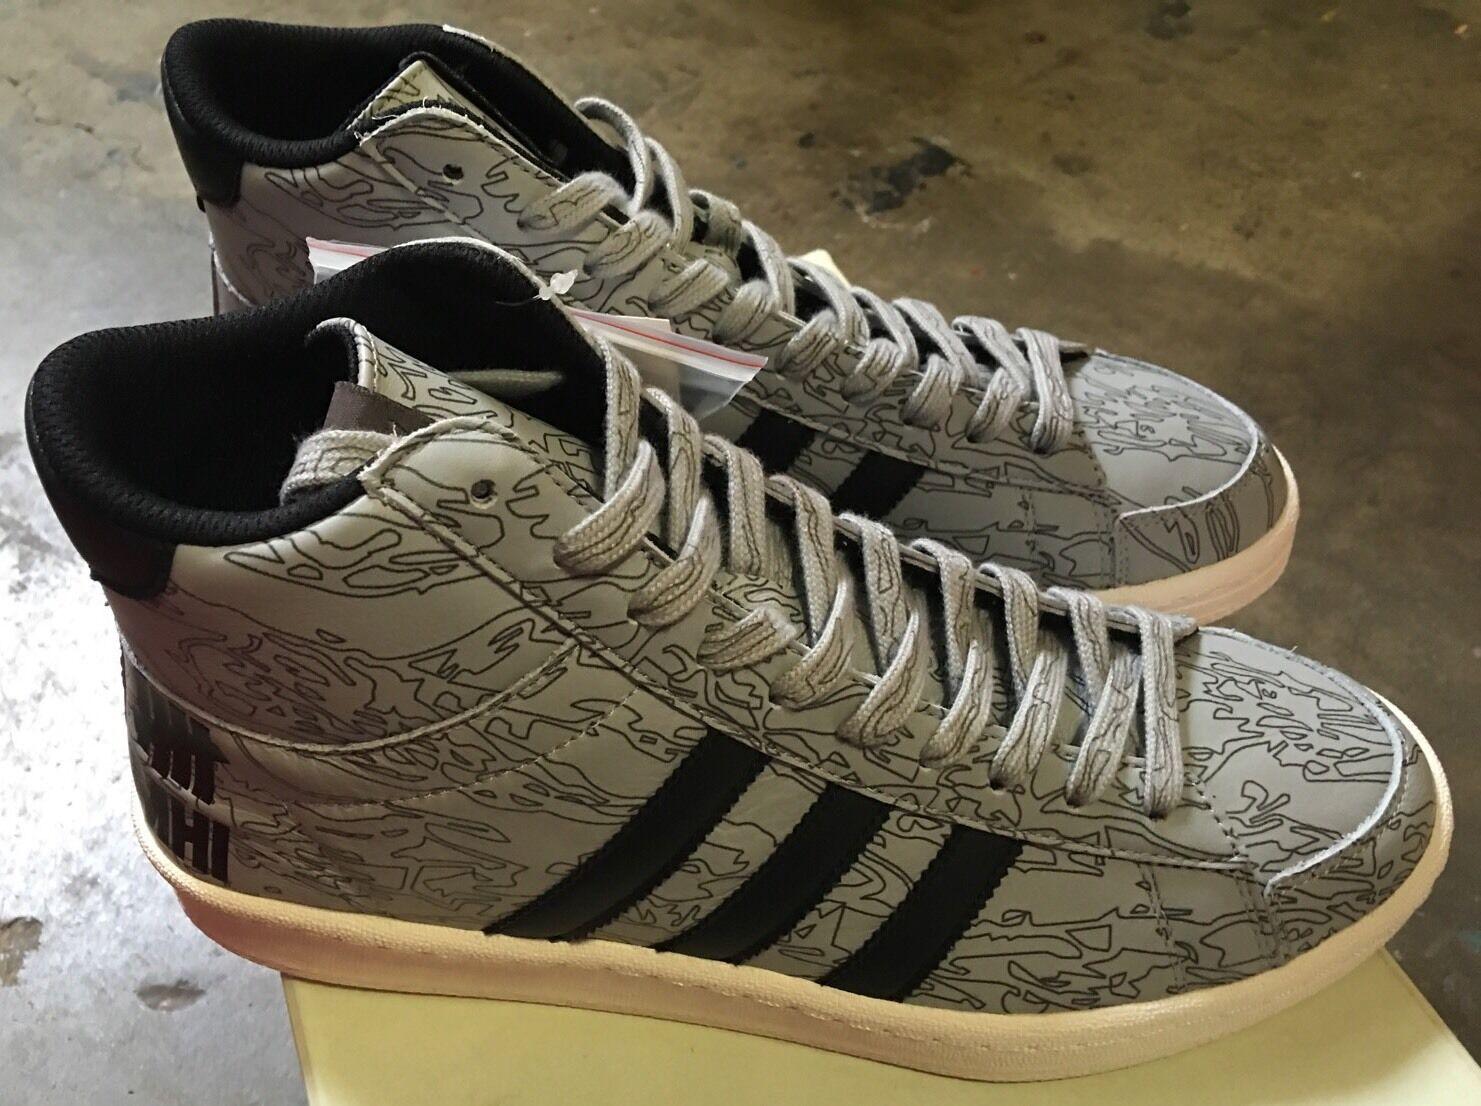 Adidas Undefeated X MHI Jabbar Mid Black White Orange Sz 4.5 NIB B33982 Undftd